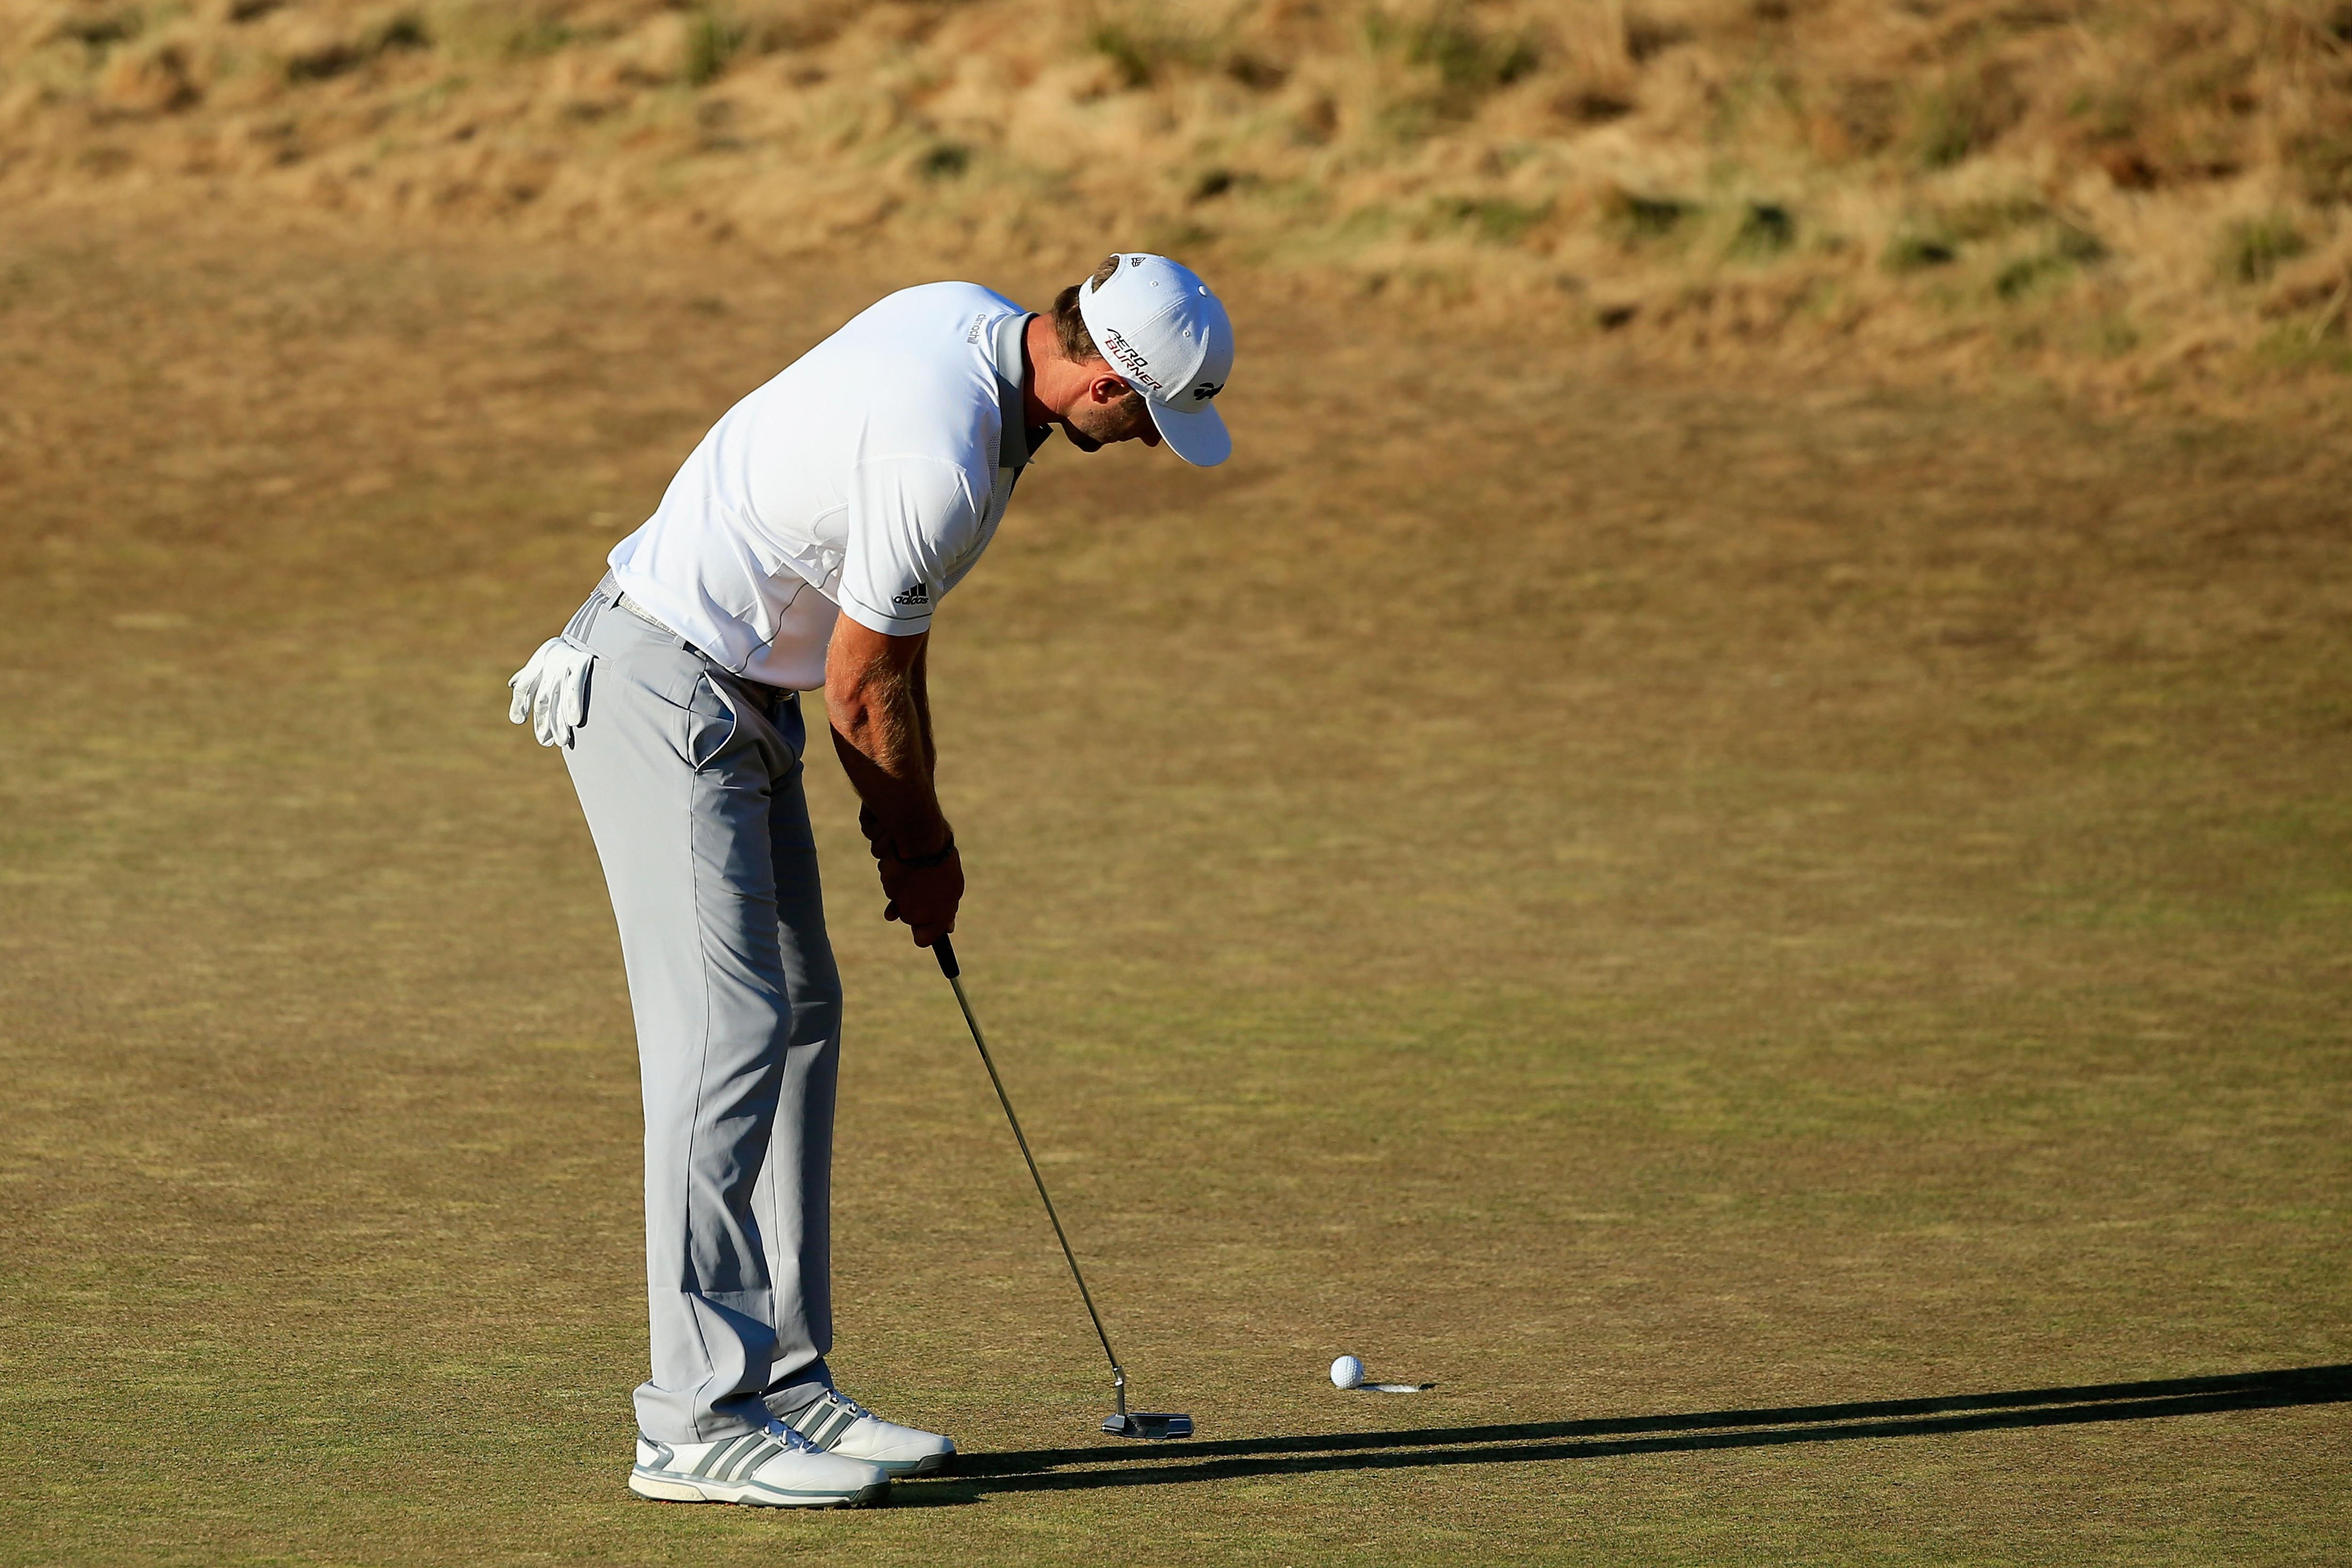 5. Dustin Johnson three-putts final hole to lose U.S. Open